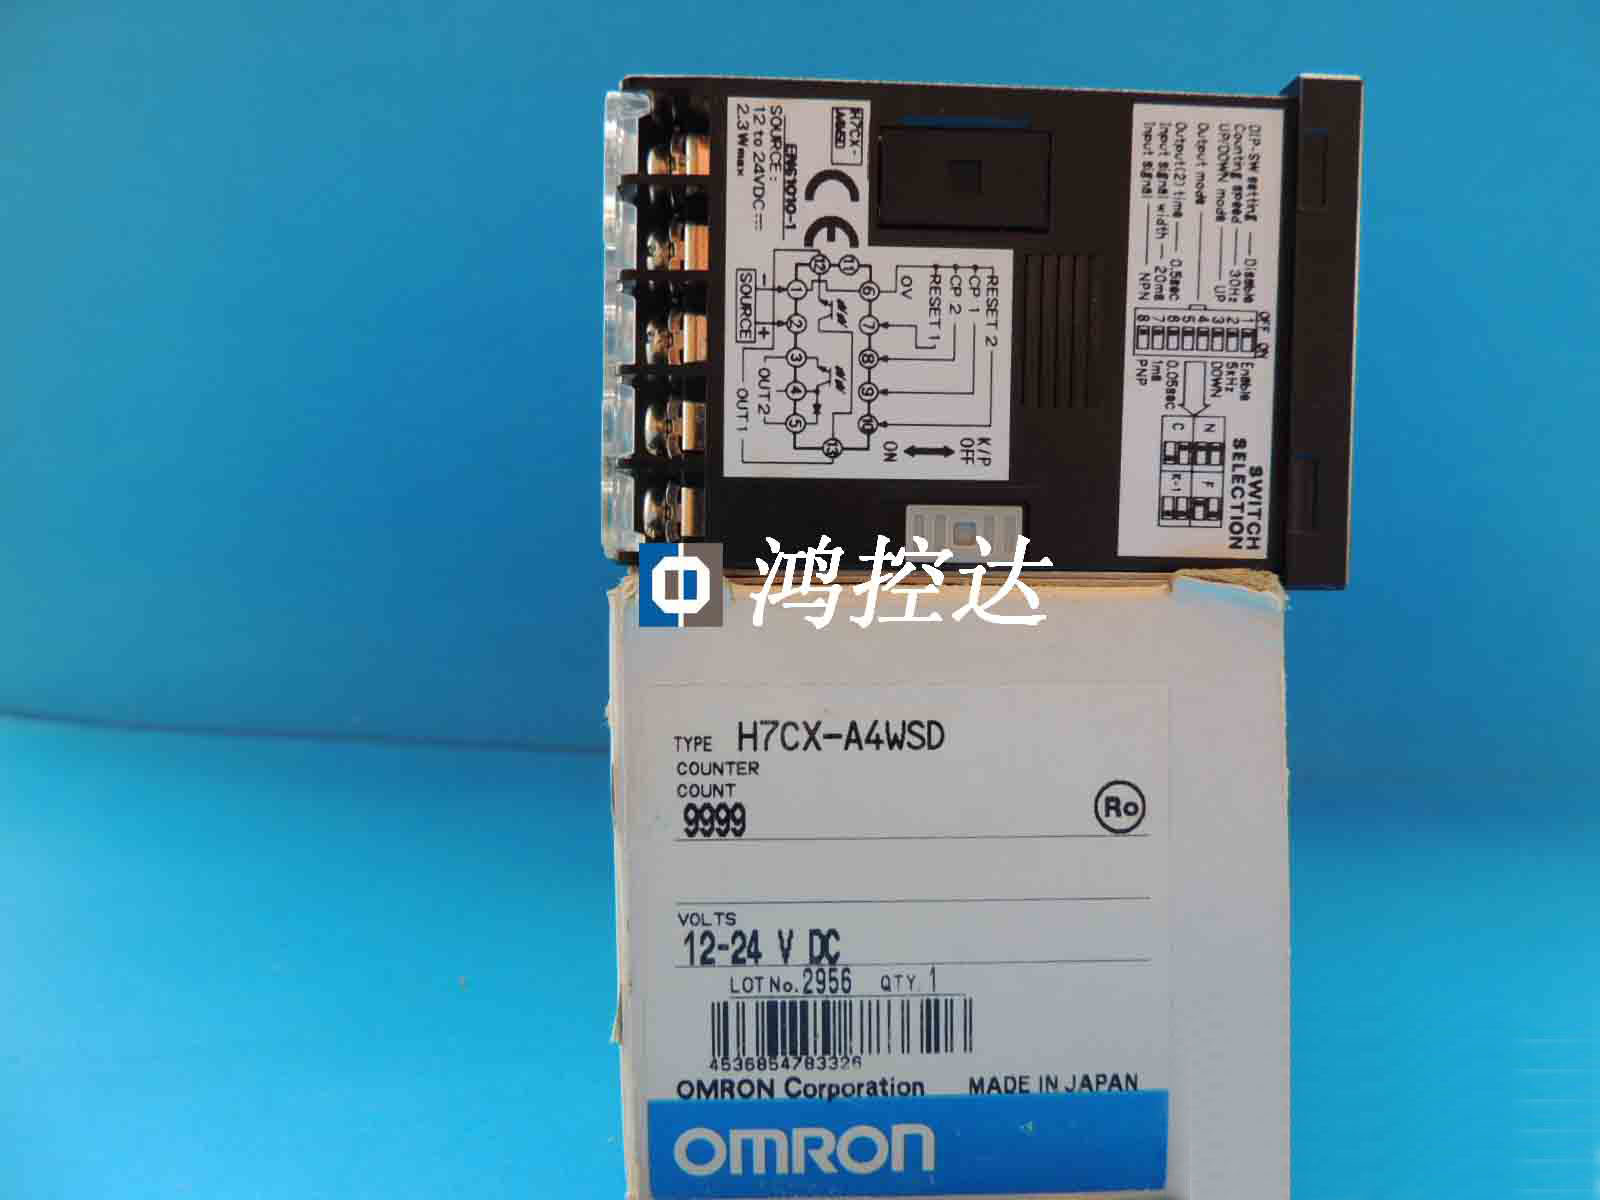 Counter H7CX-A4WSDCounter H7CX-A4WSD